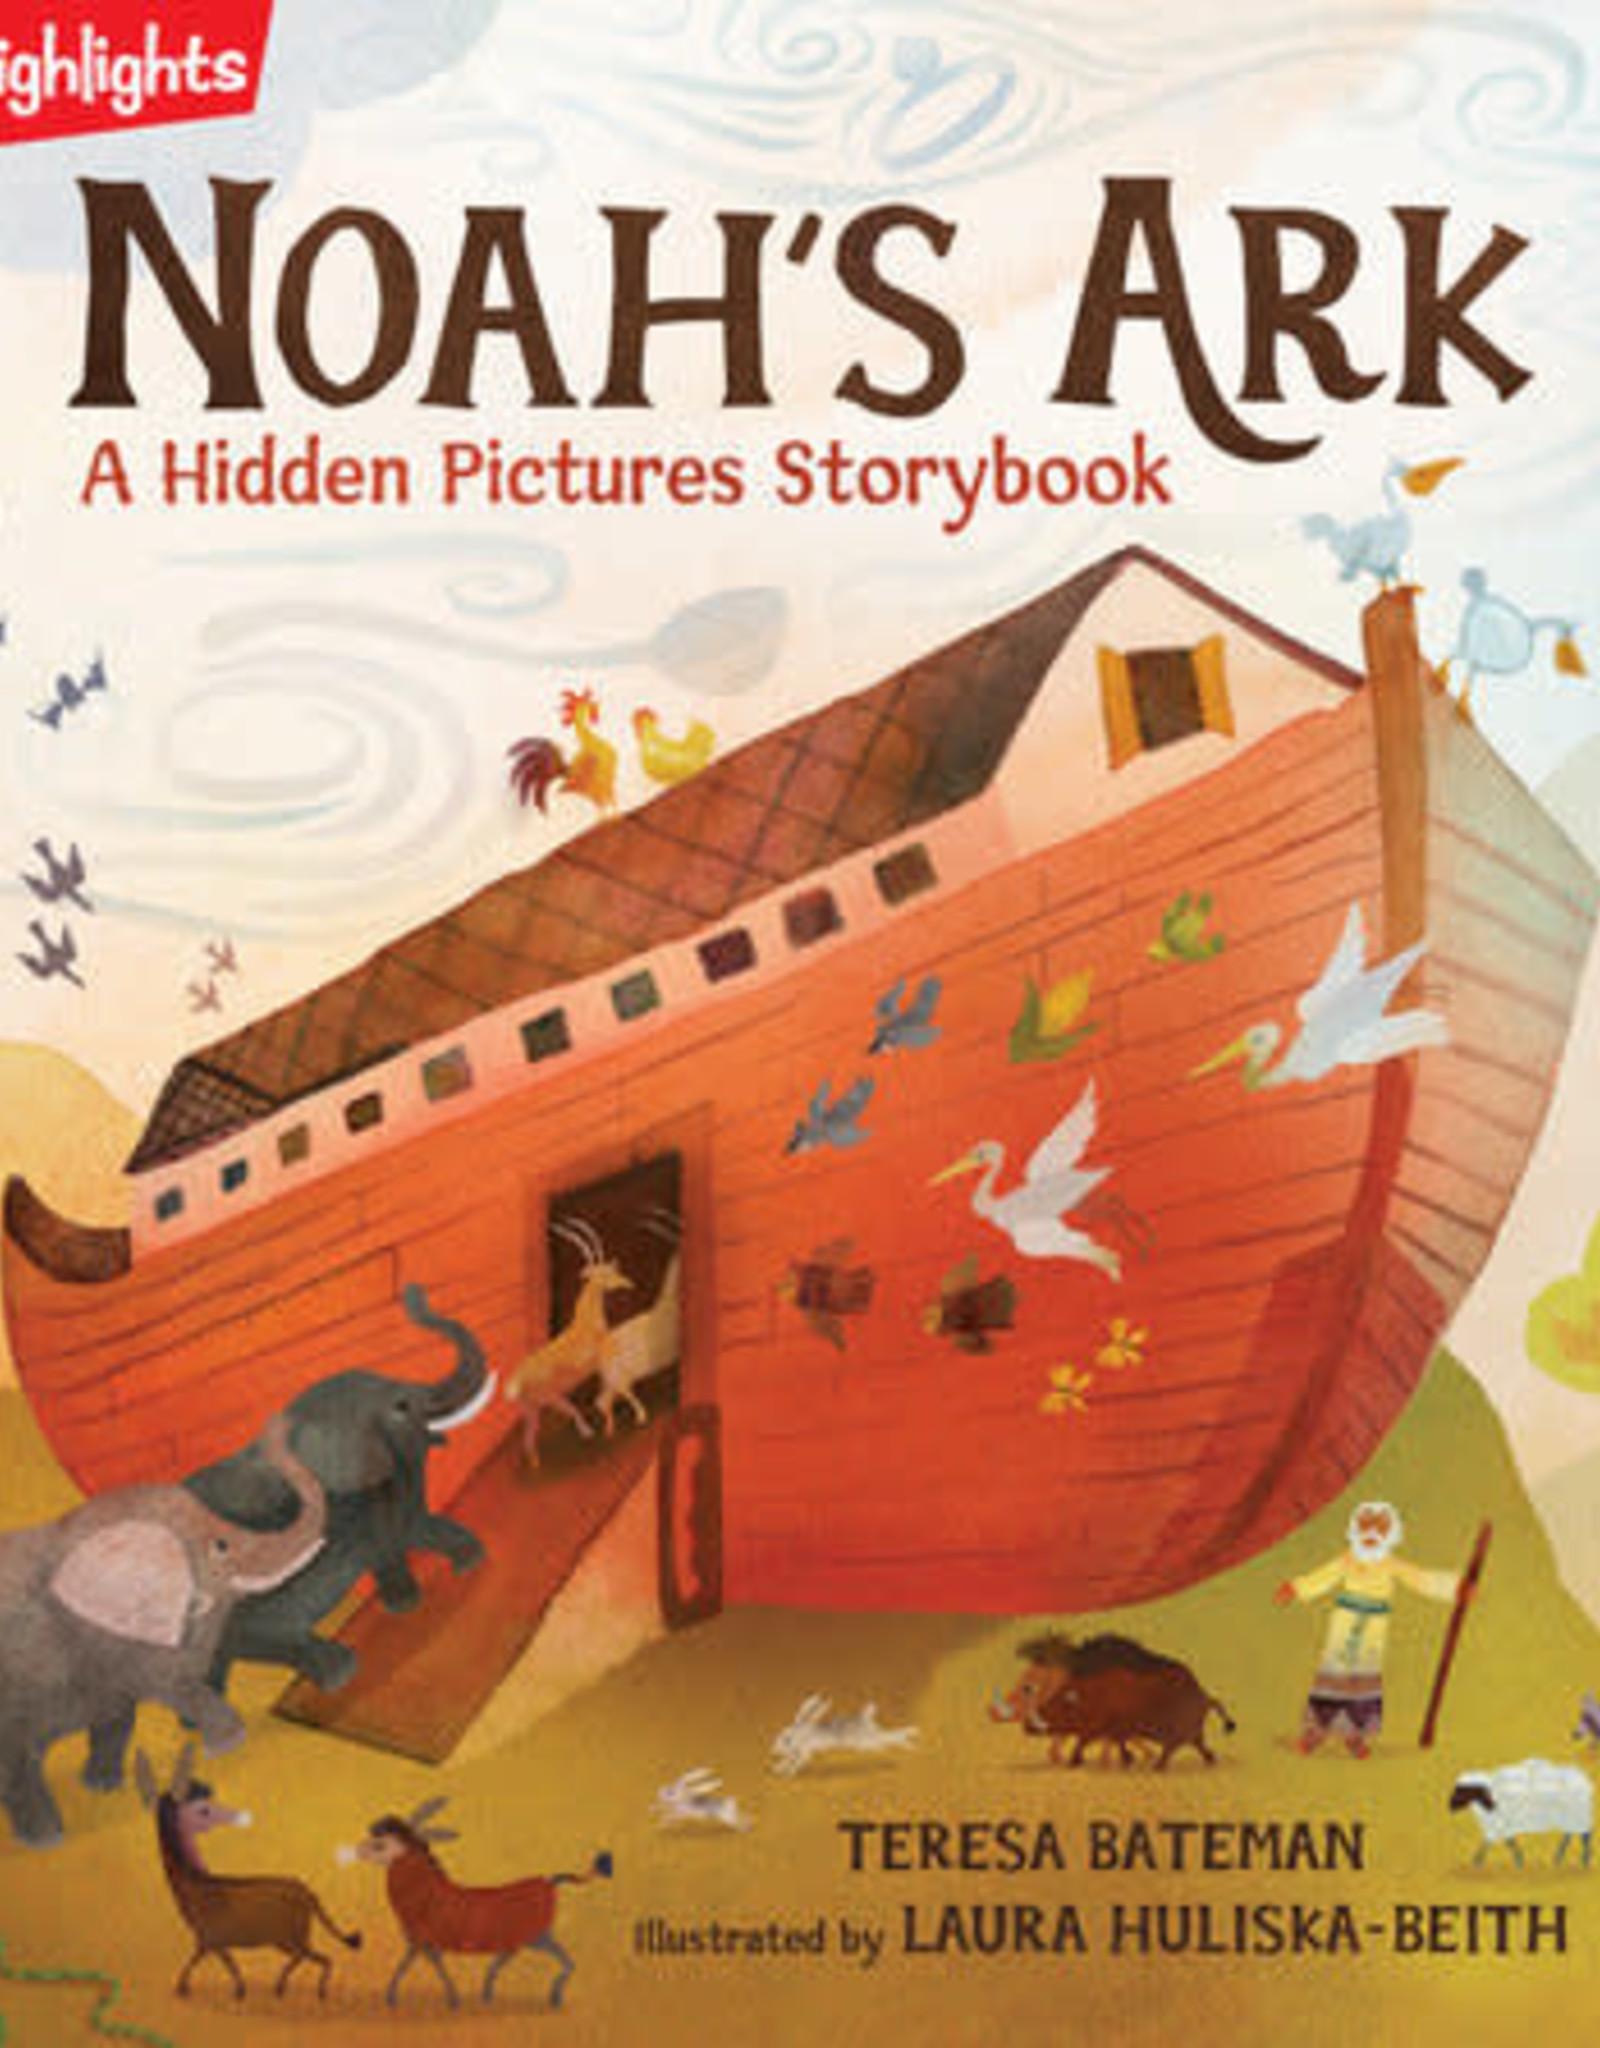 Highlights Noah's Ark